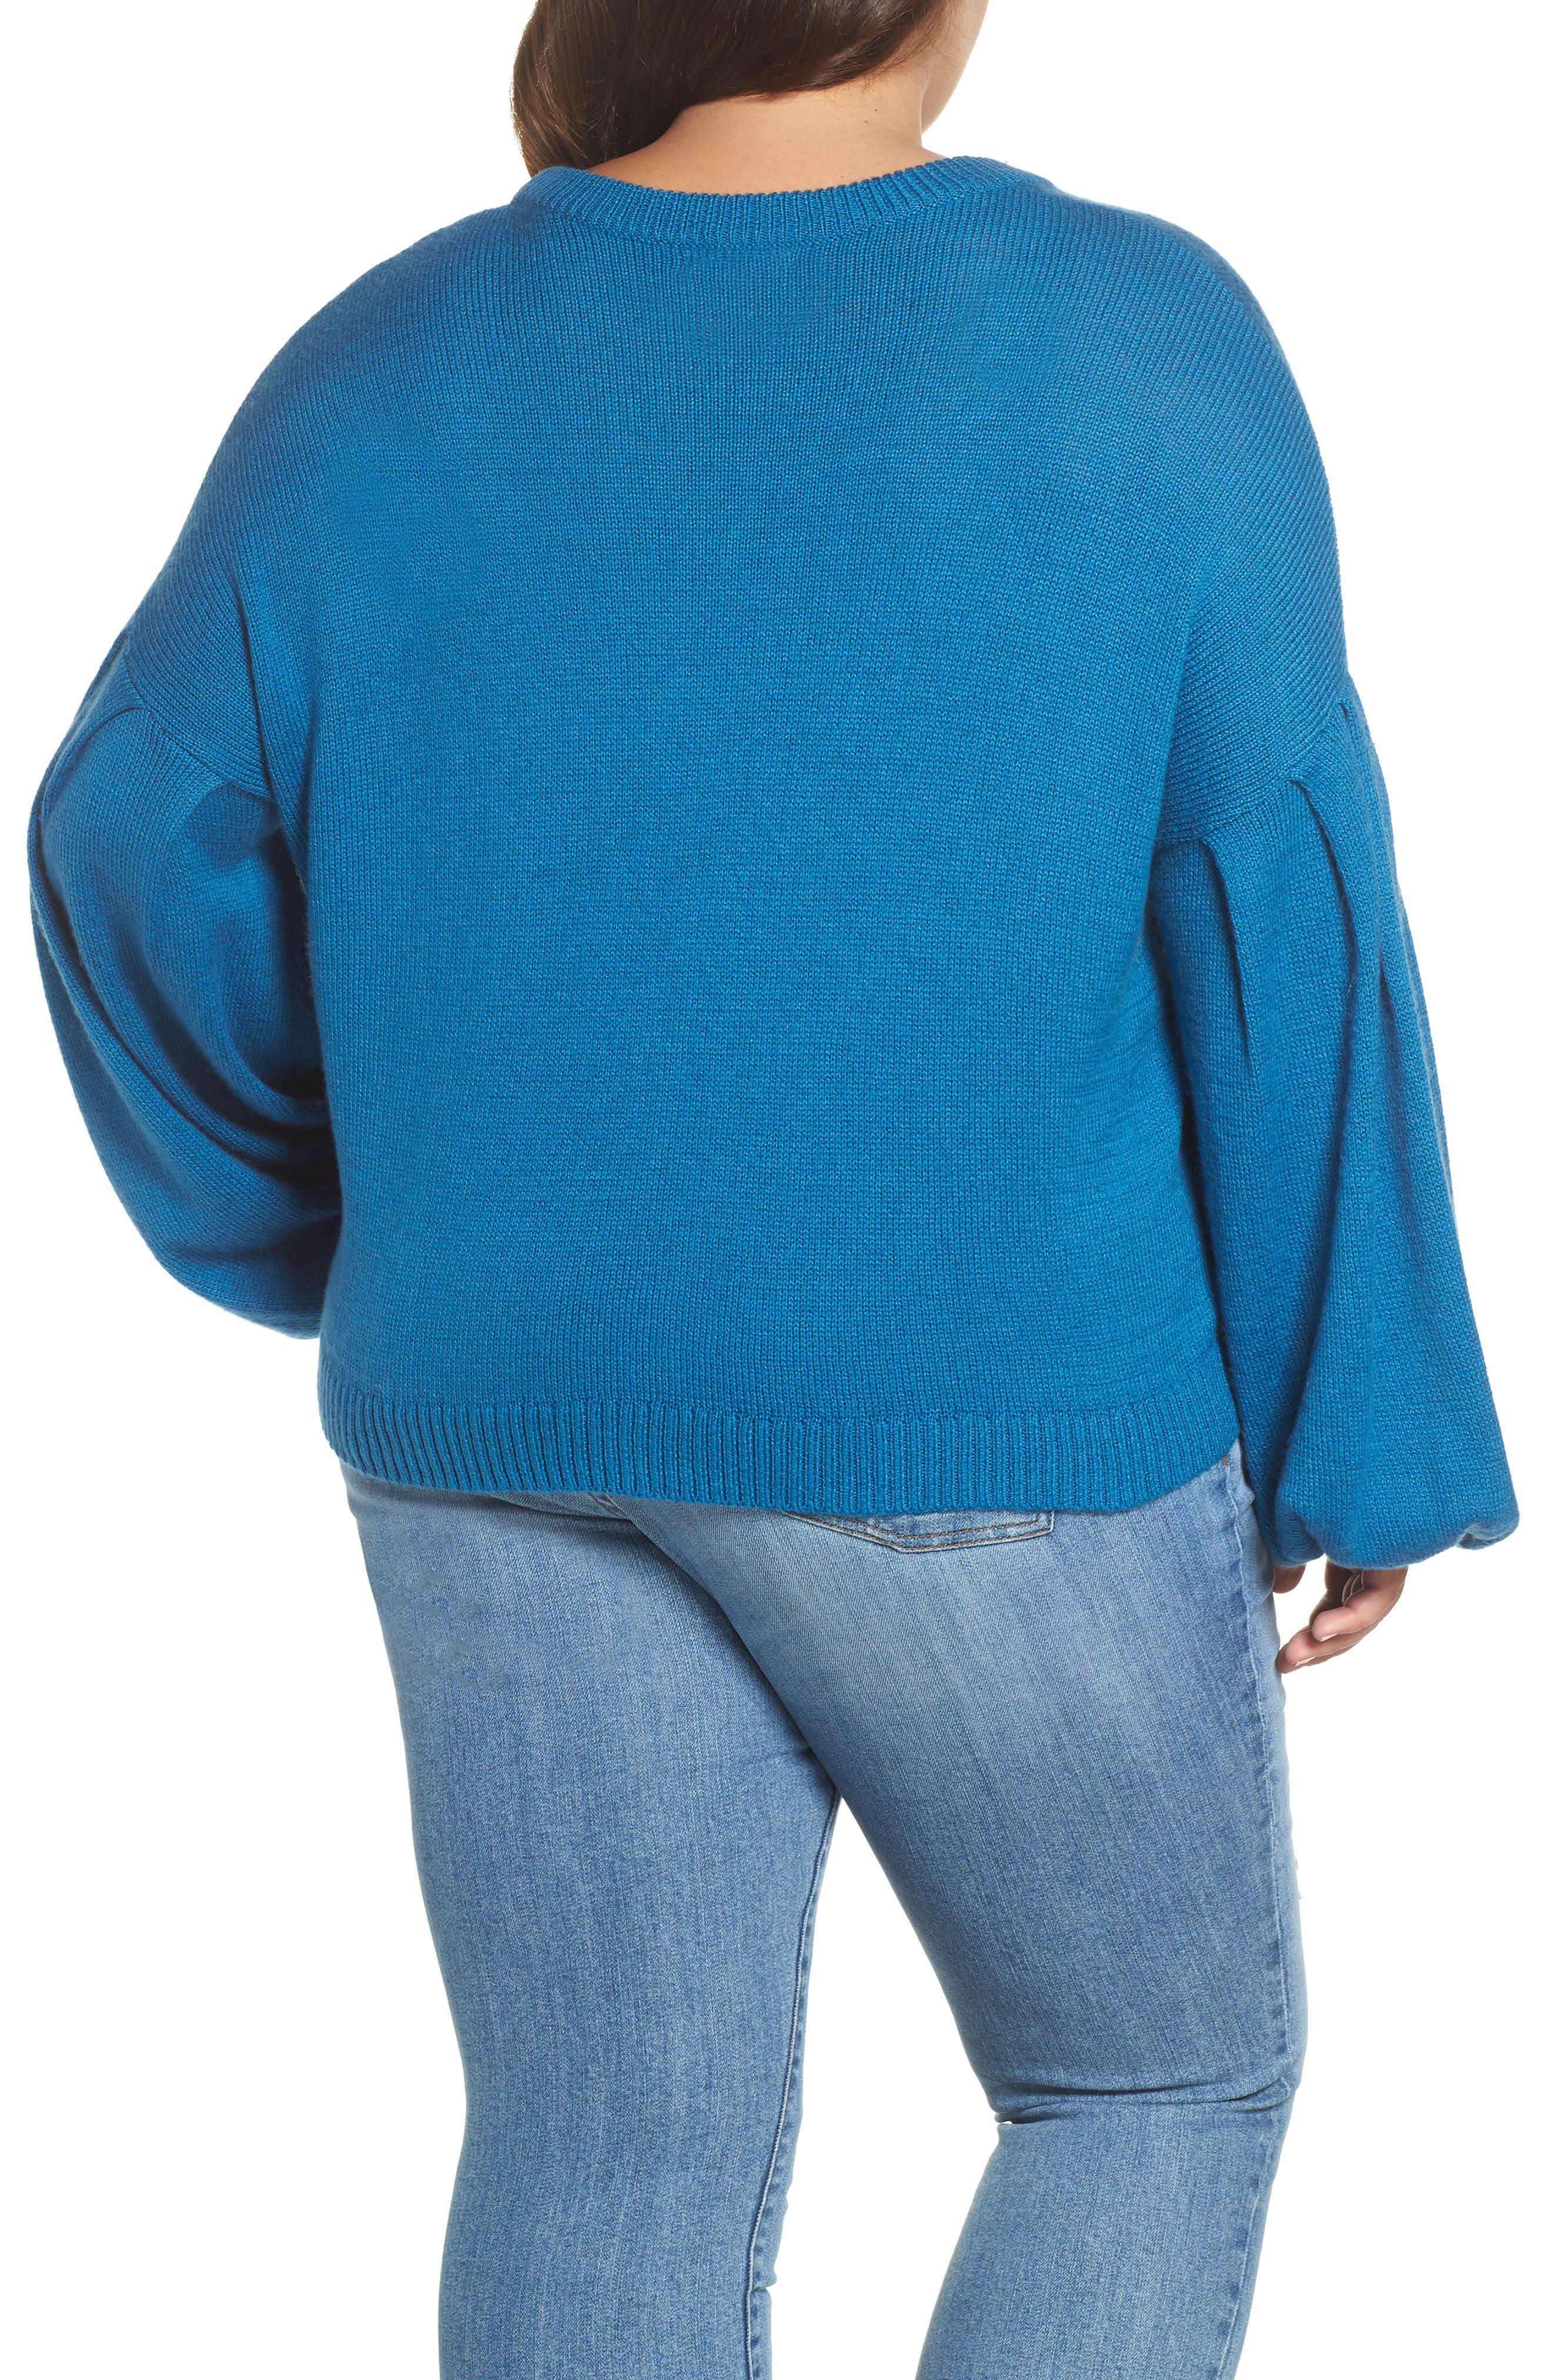 Blouson Sleeve Sweater,                             Alternate thumbnail 8, color,                             TEAL SAPPHIRE